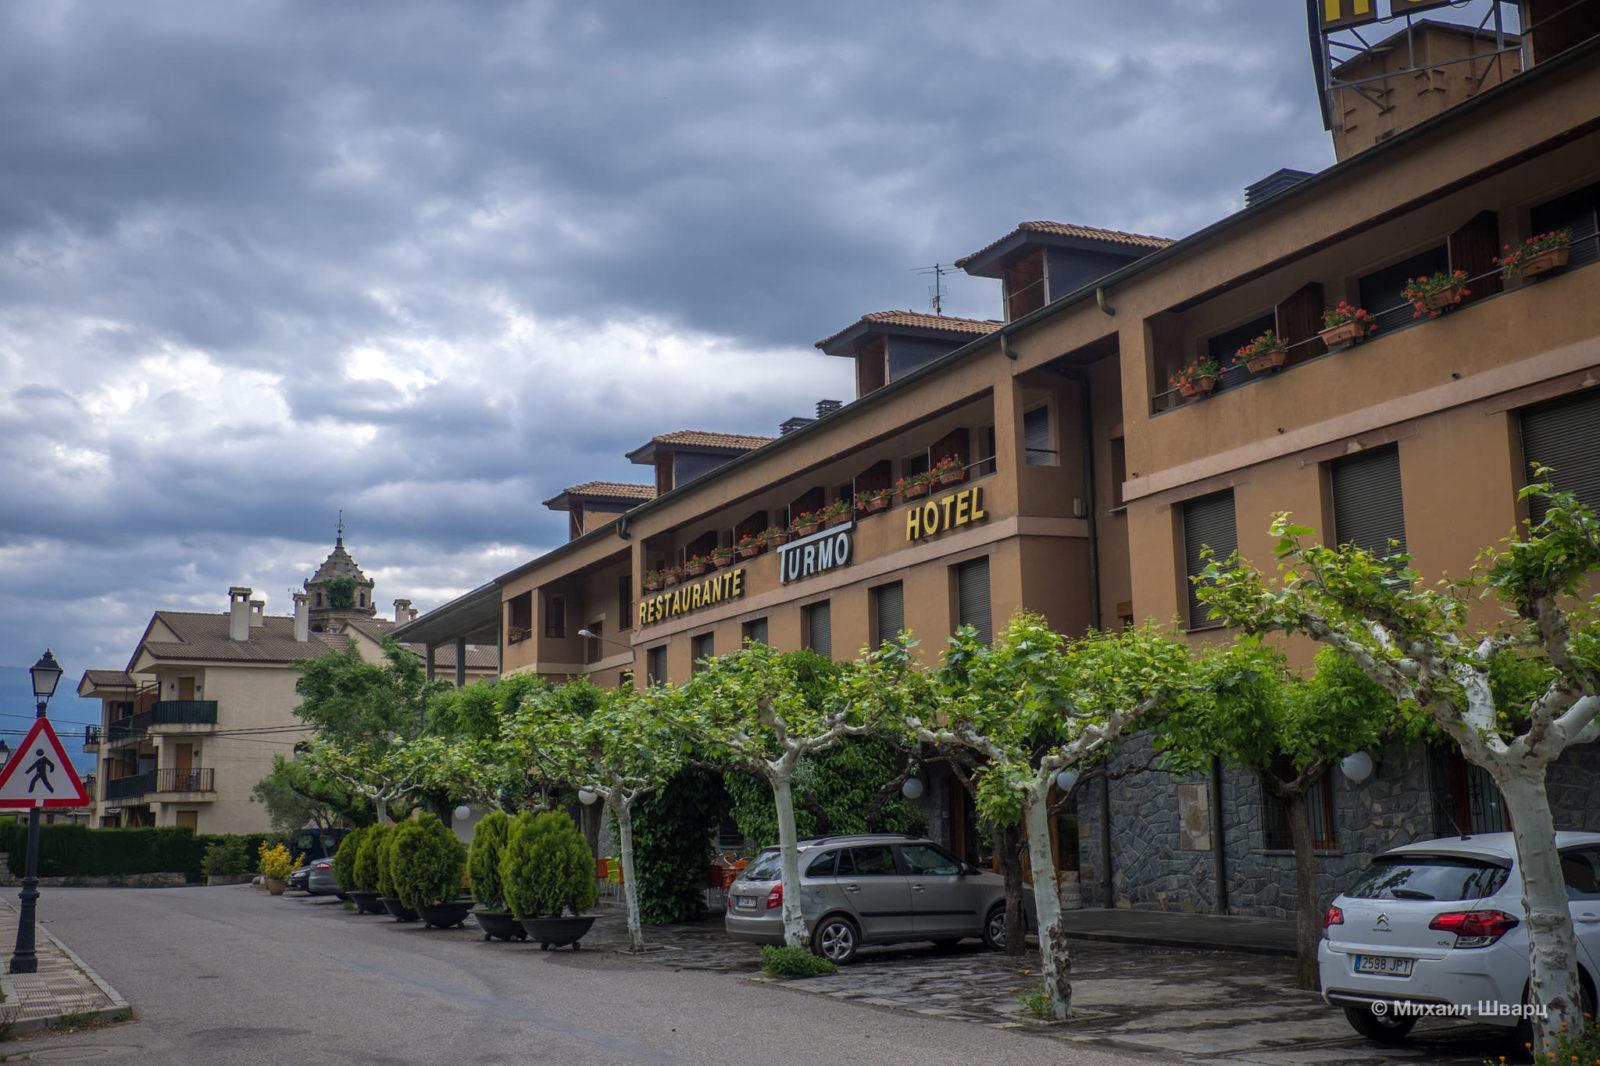 Hotel Turmo с рестораном